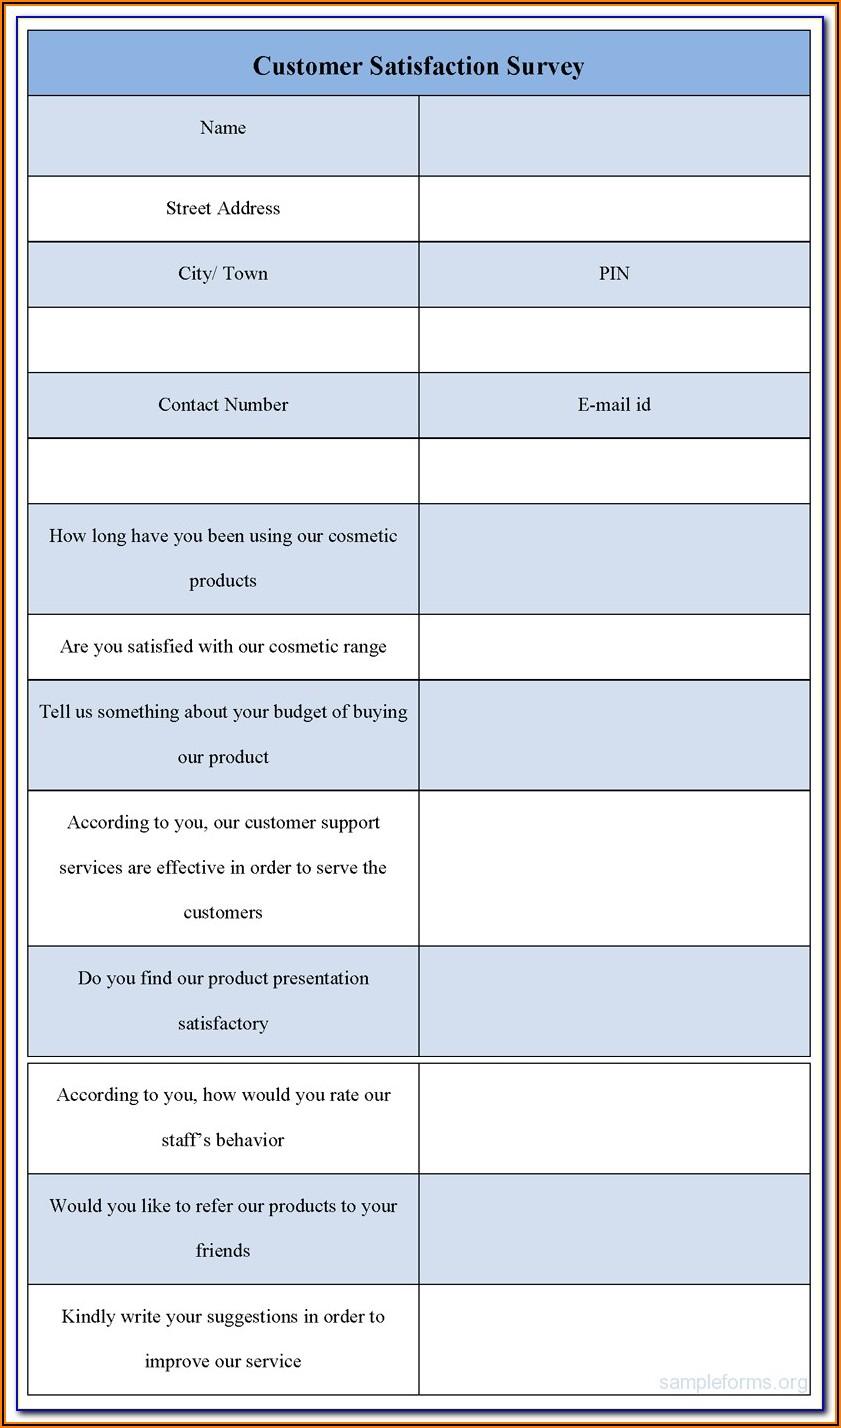 Customer Satisfaction Survey Form Iso 9001